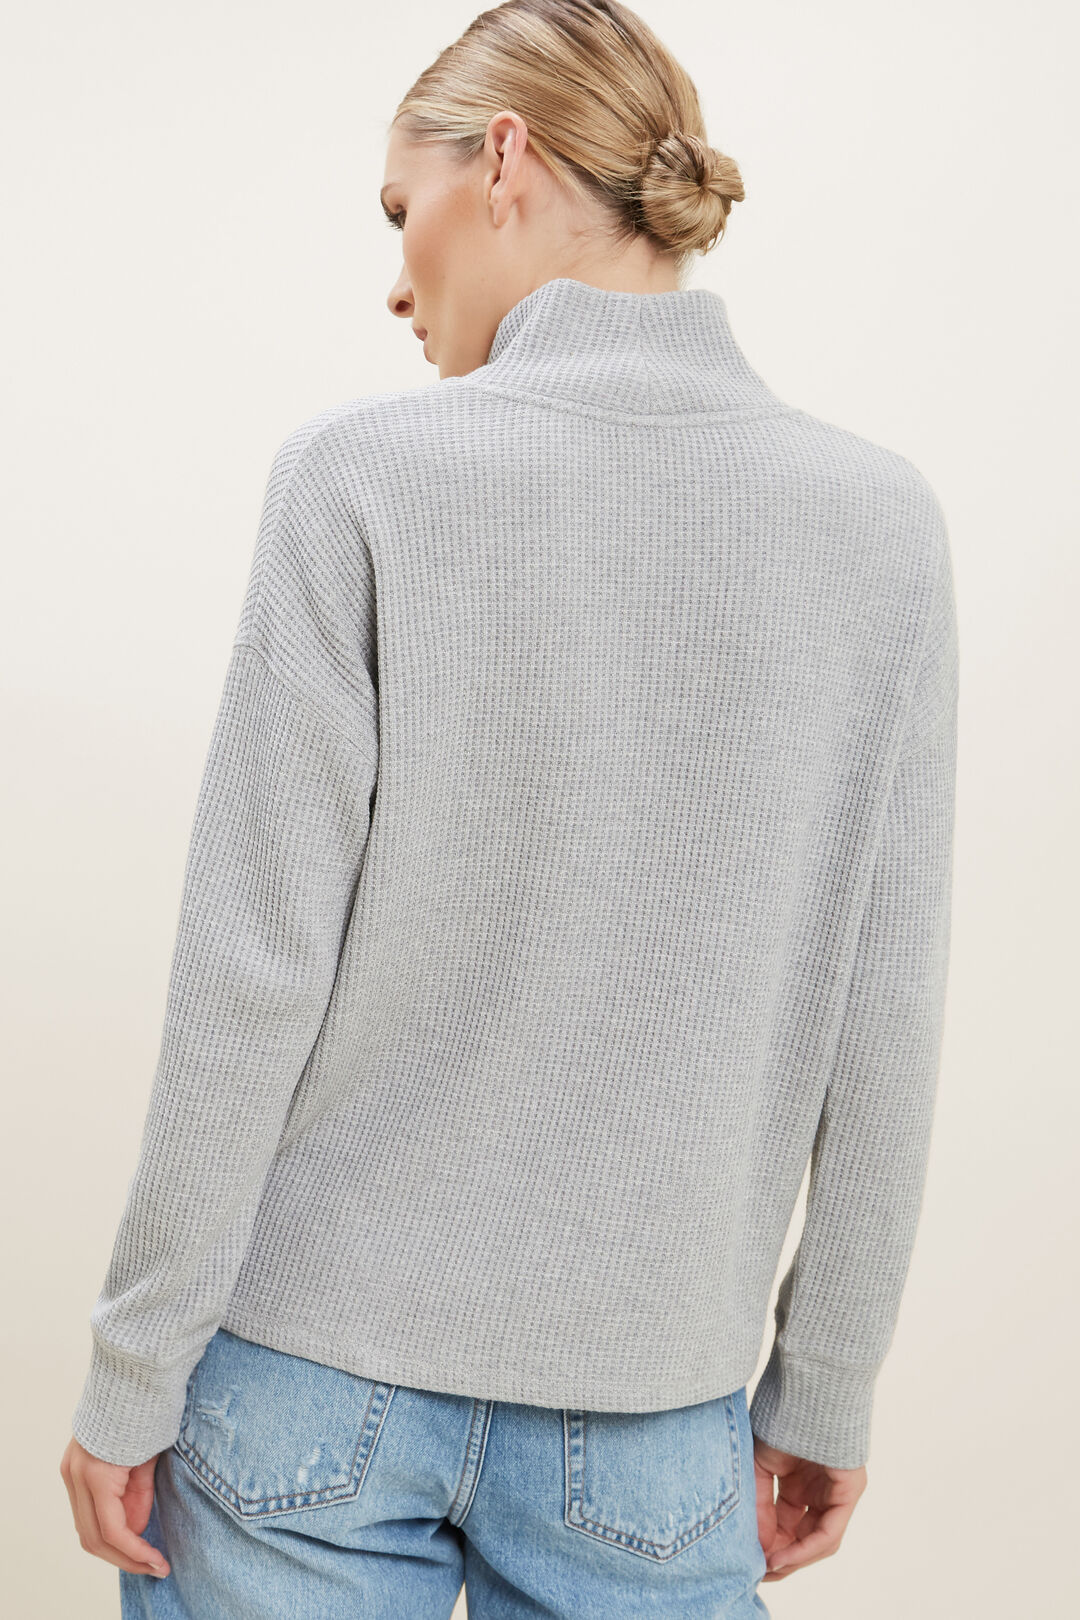 Textured Mock Neck Top  Dim Grey Marle  hi-res